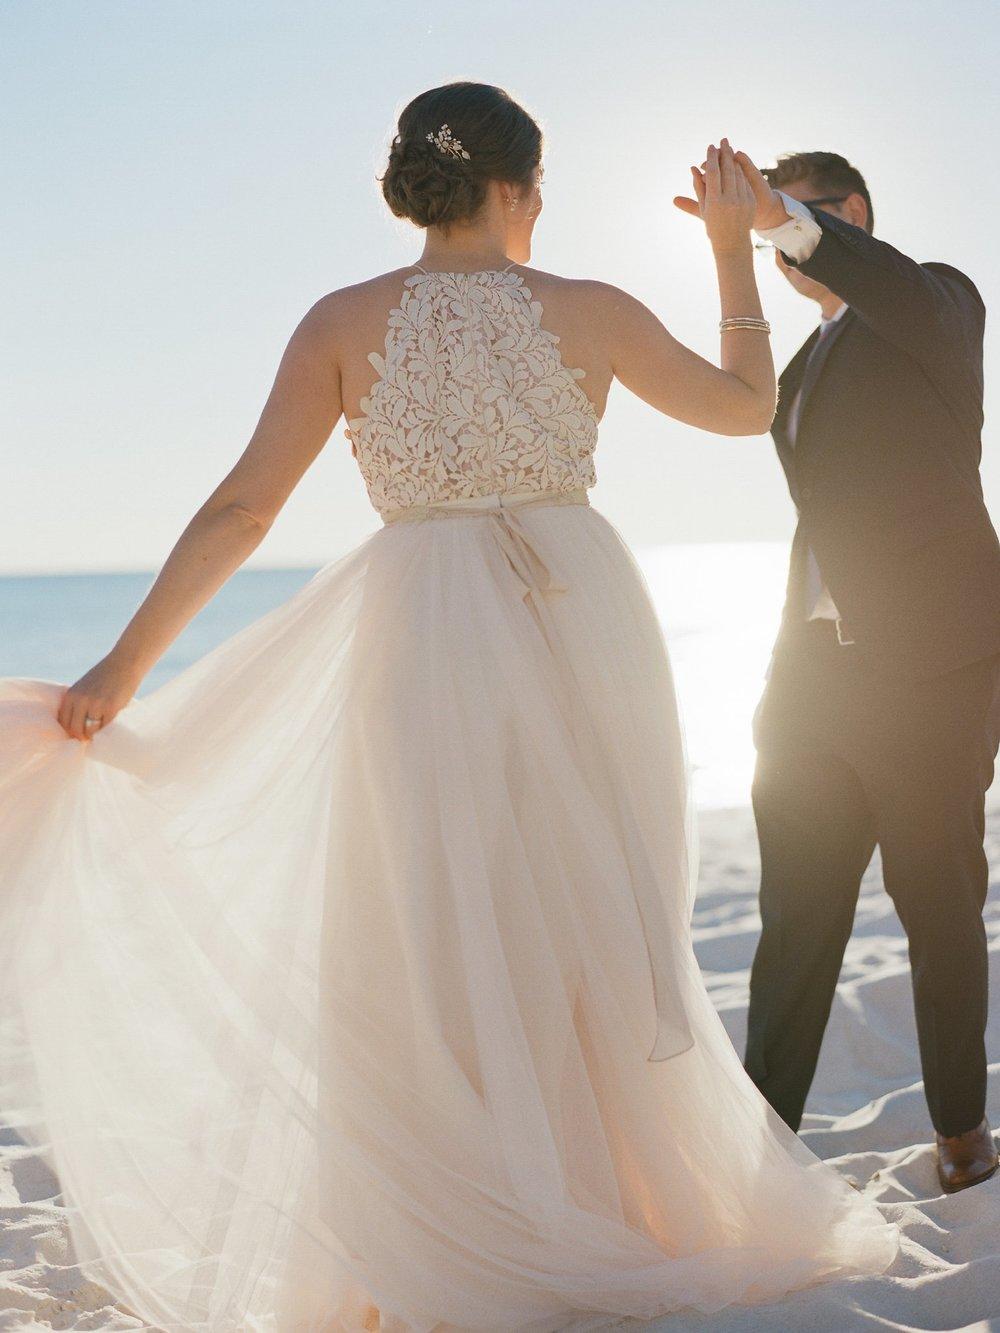 inlet beach wedding 30a wedding inlet beach wedding photographer shannon griffin photography_0026.jpg